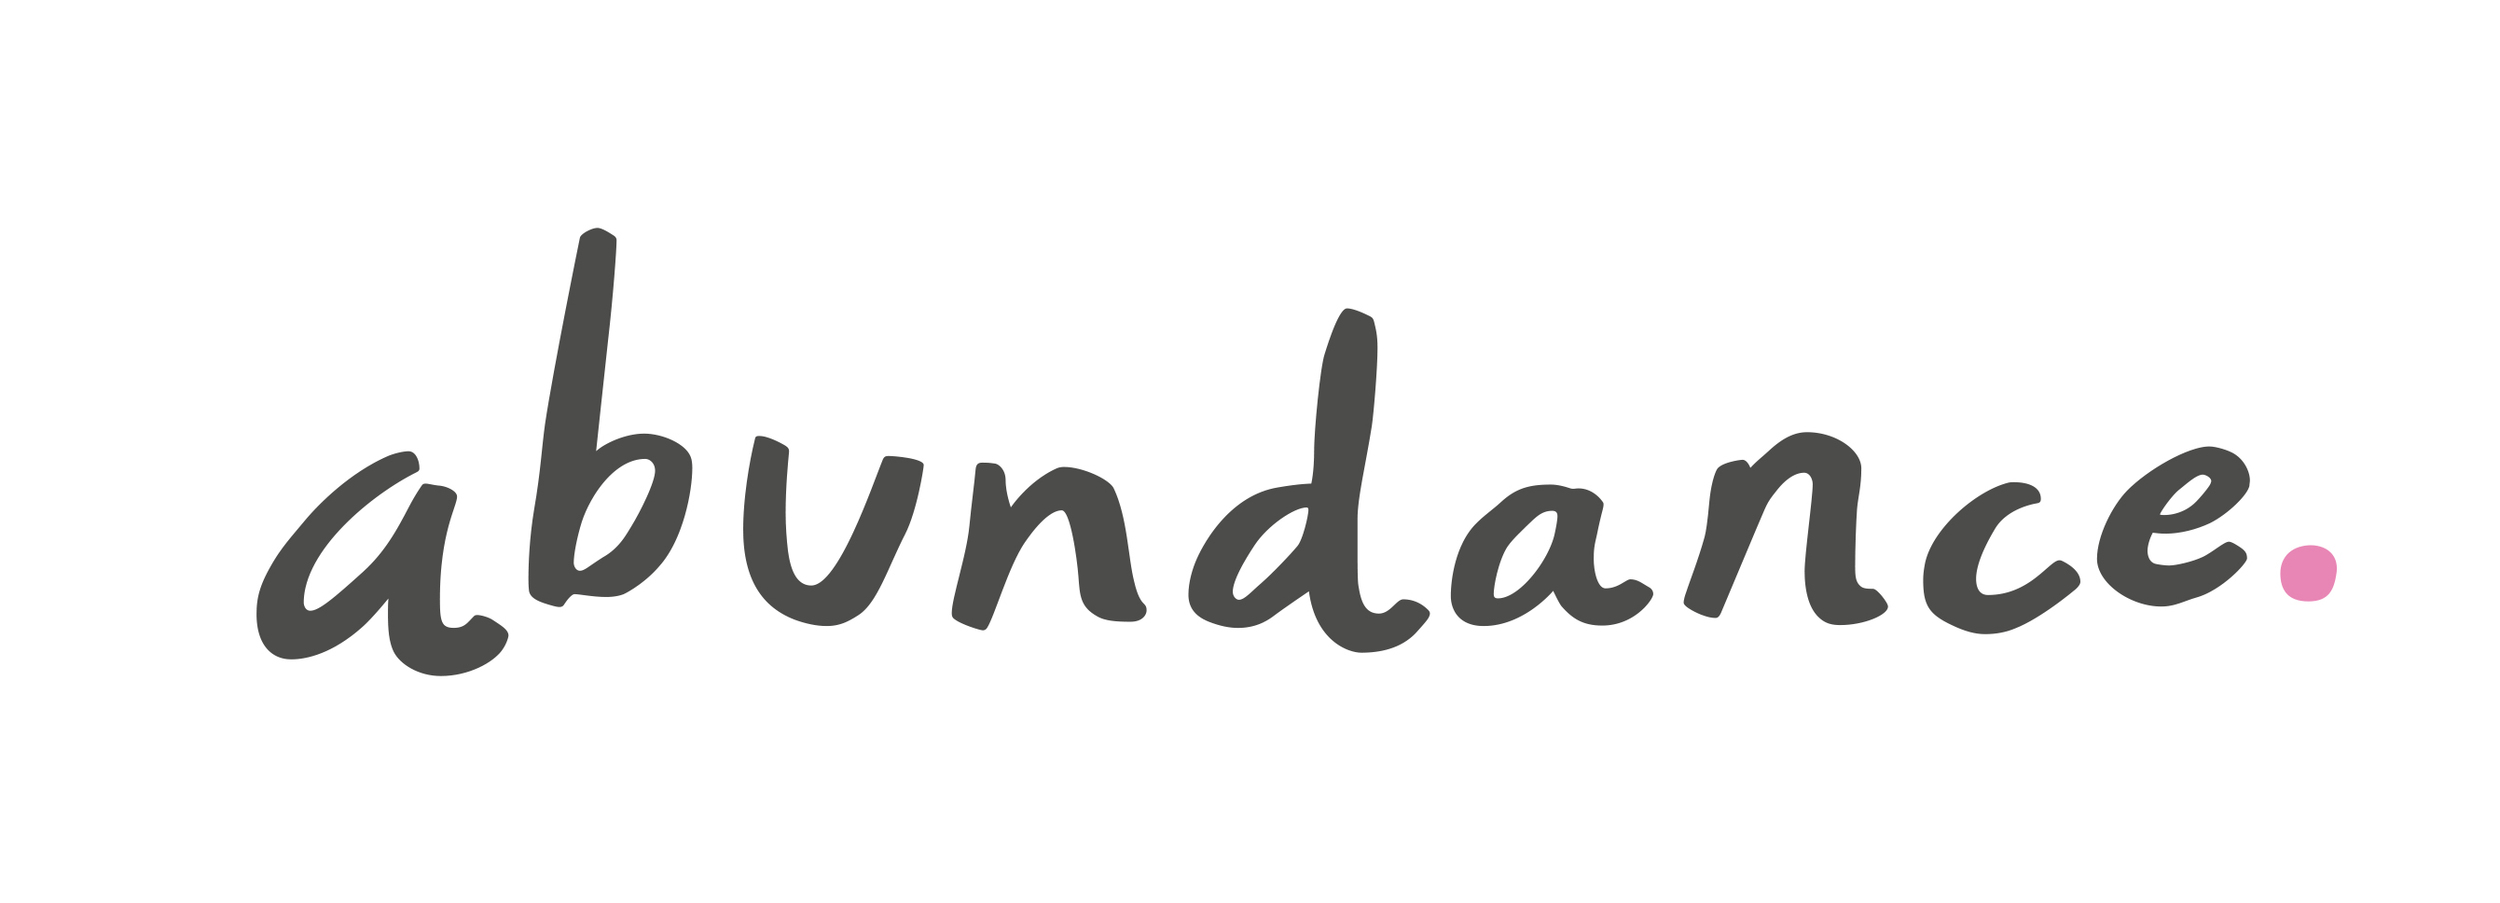 Abundance_Wordmark_OnWhite_RGB.jpg